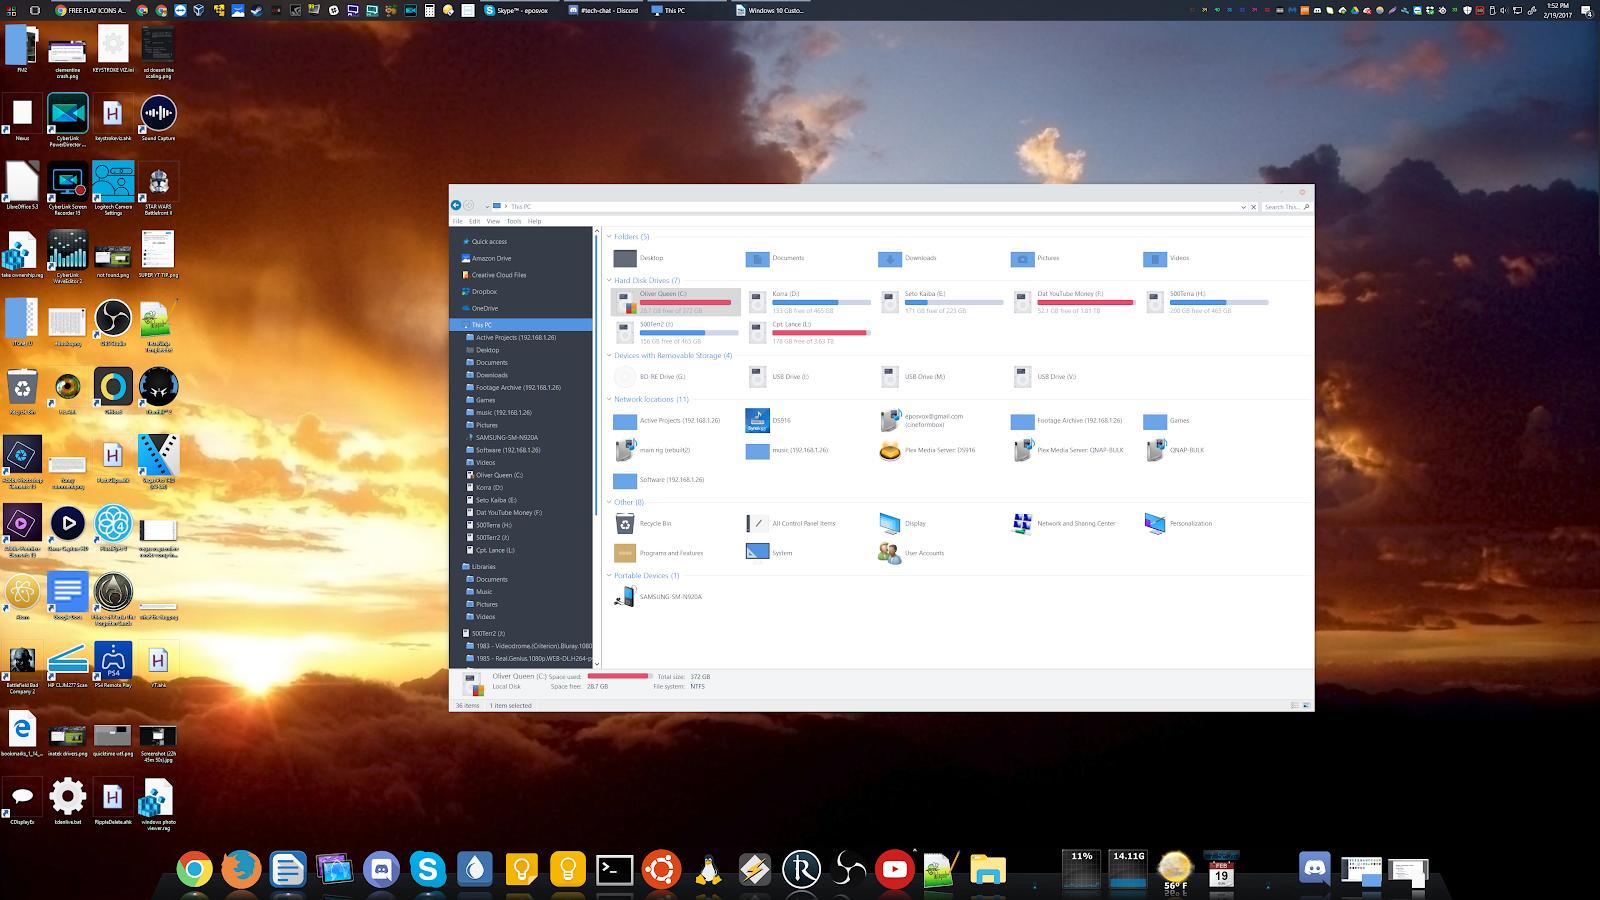 Windows Desktop Zezima 2-19-17.png